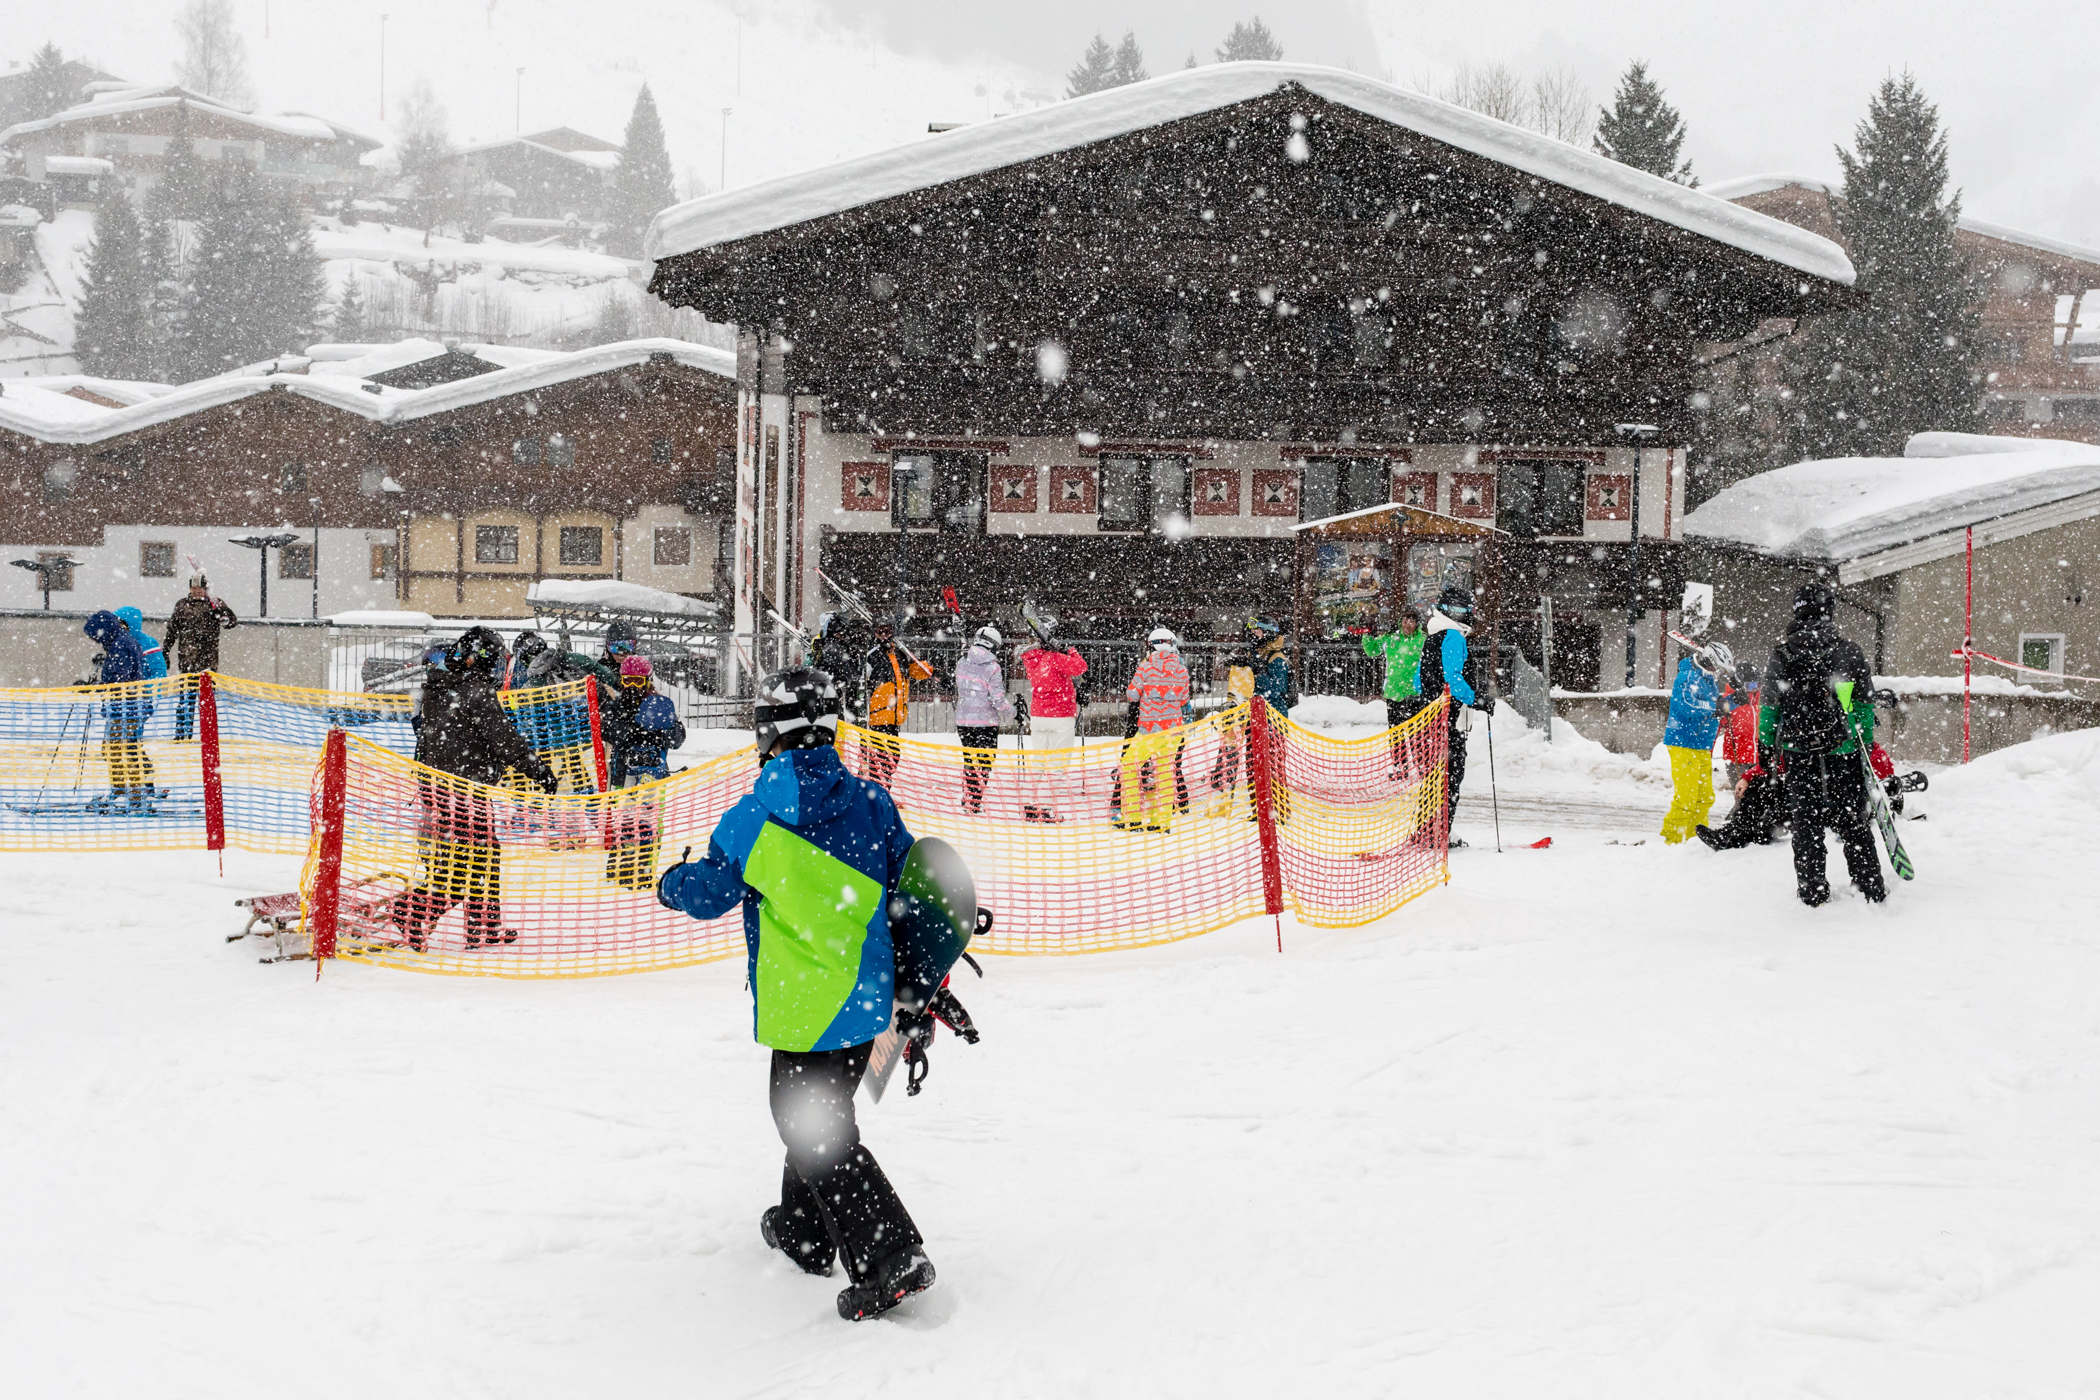 Heftigt snevejr over Hinterglemm og Hotel Pinzgauer Hof // Foto: Troels Kjems